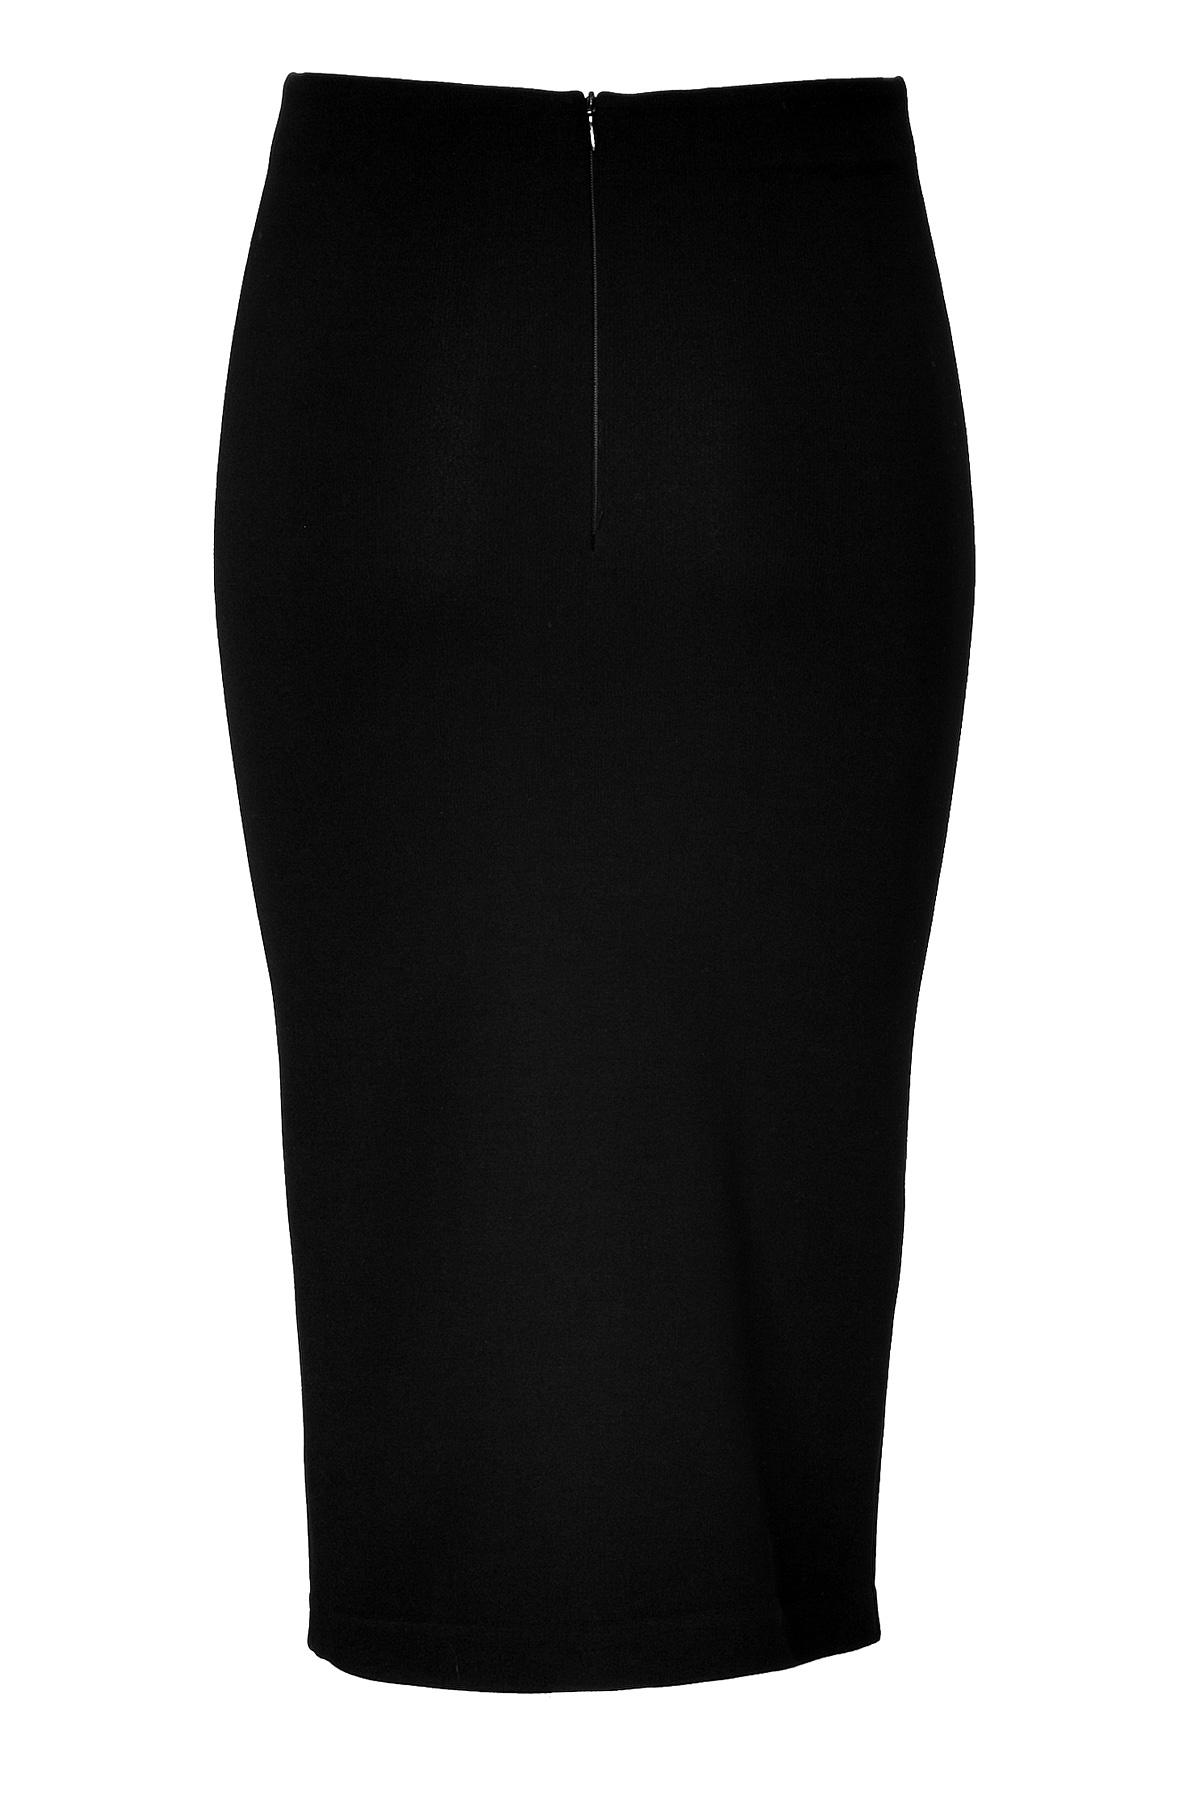 mcq midi length pencil skirt in black lyst